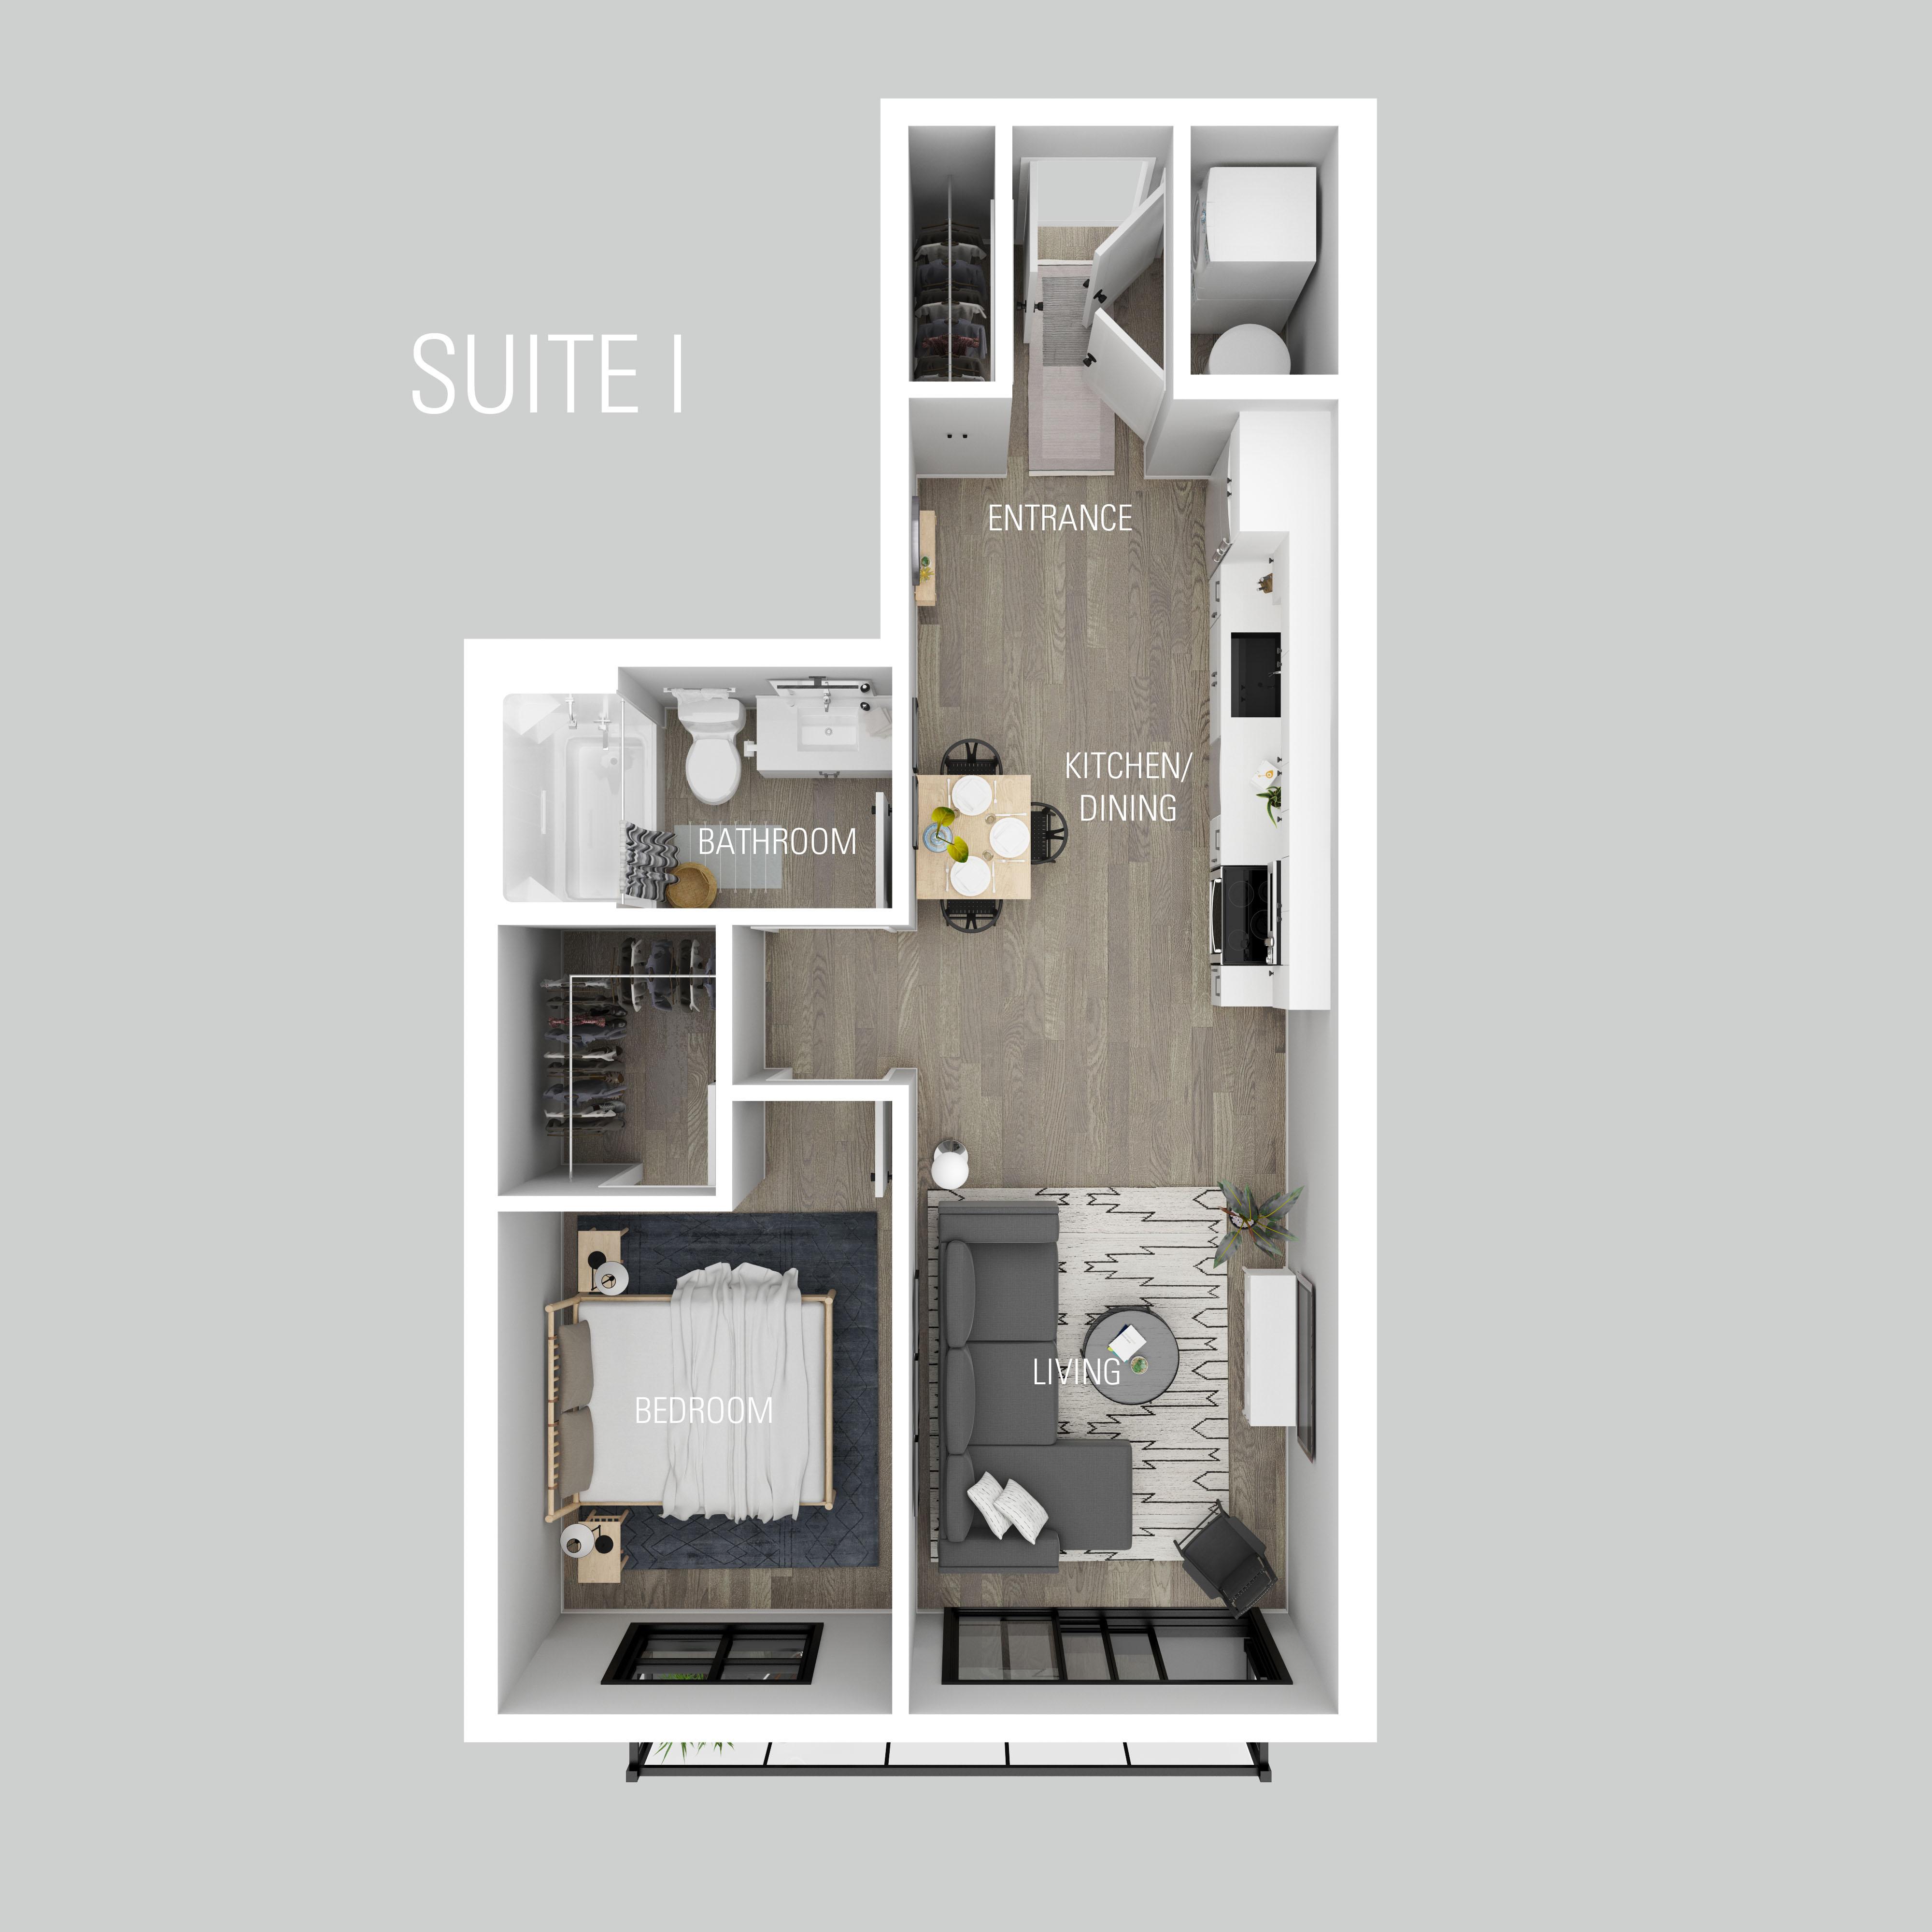 30UC Residence One image